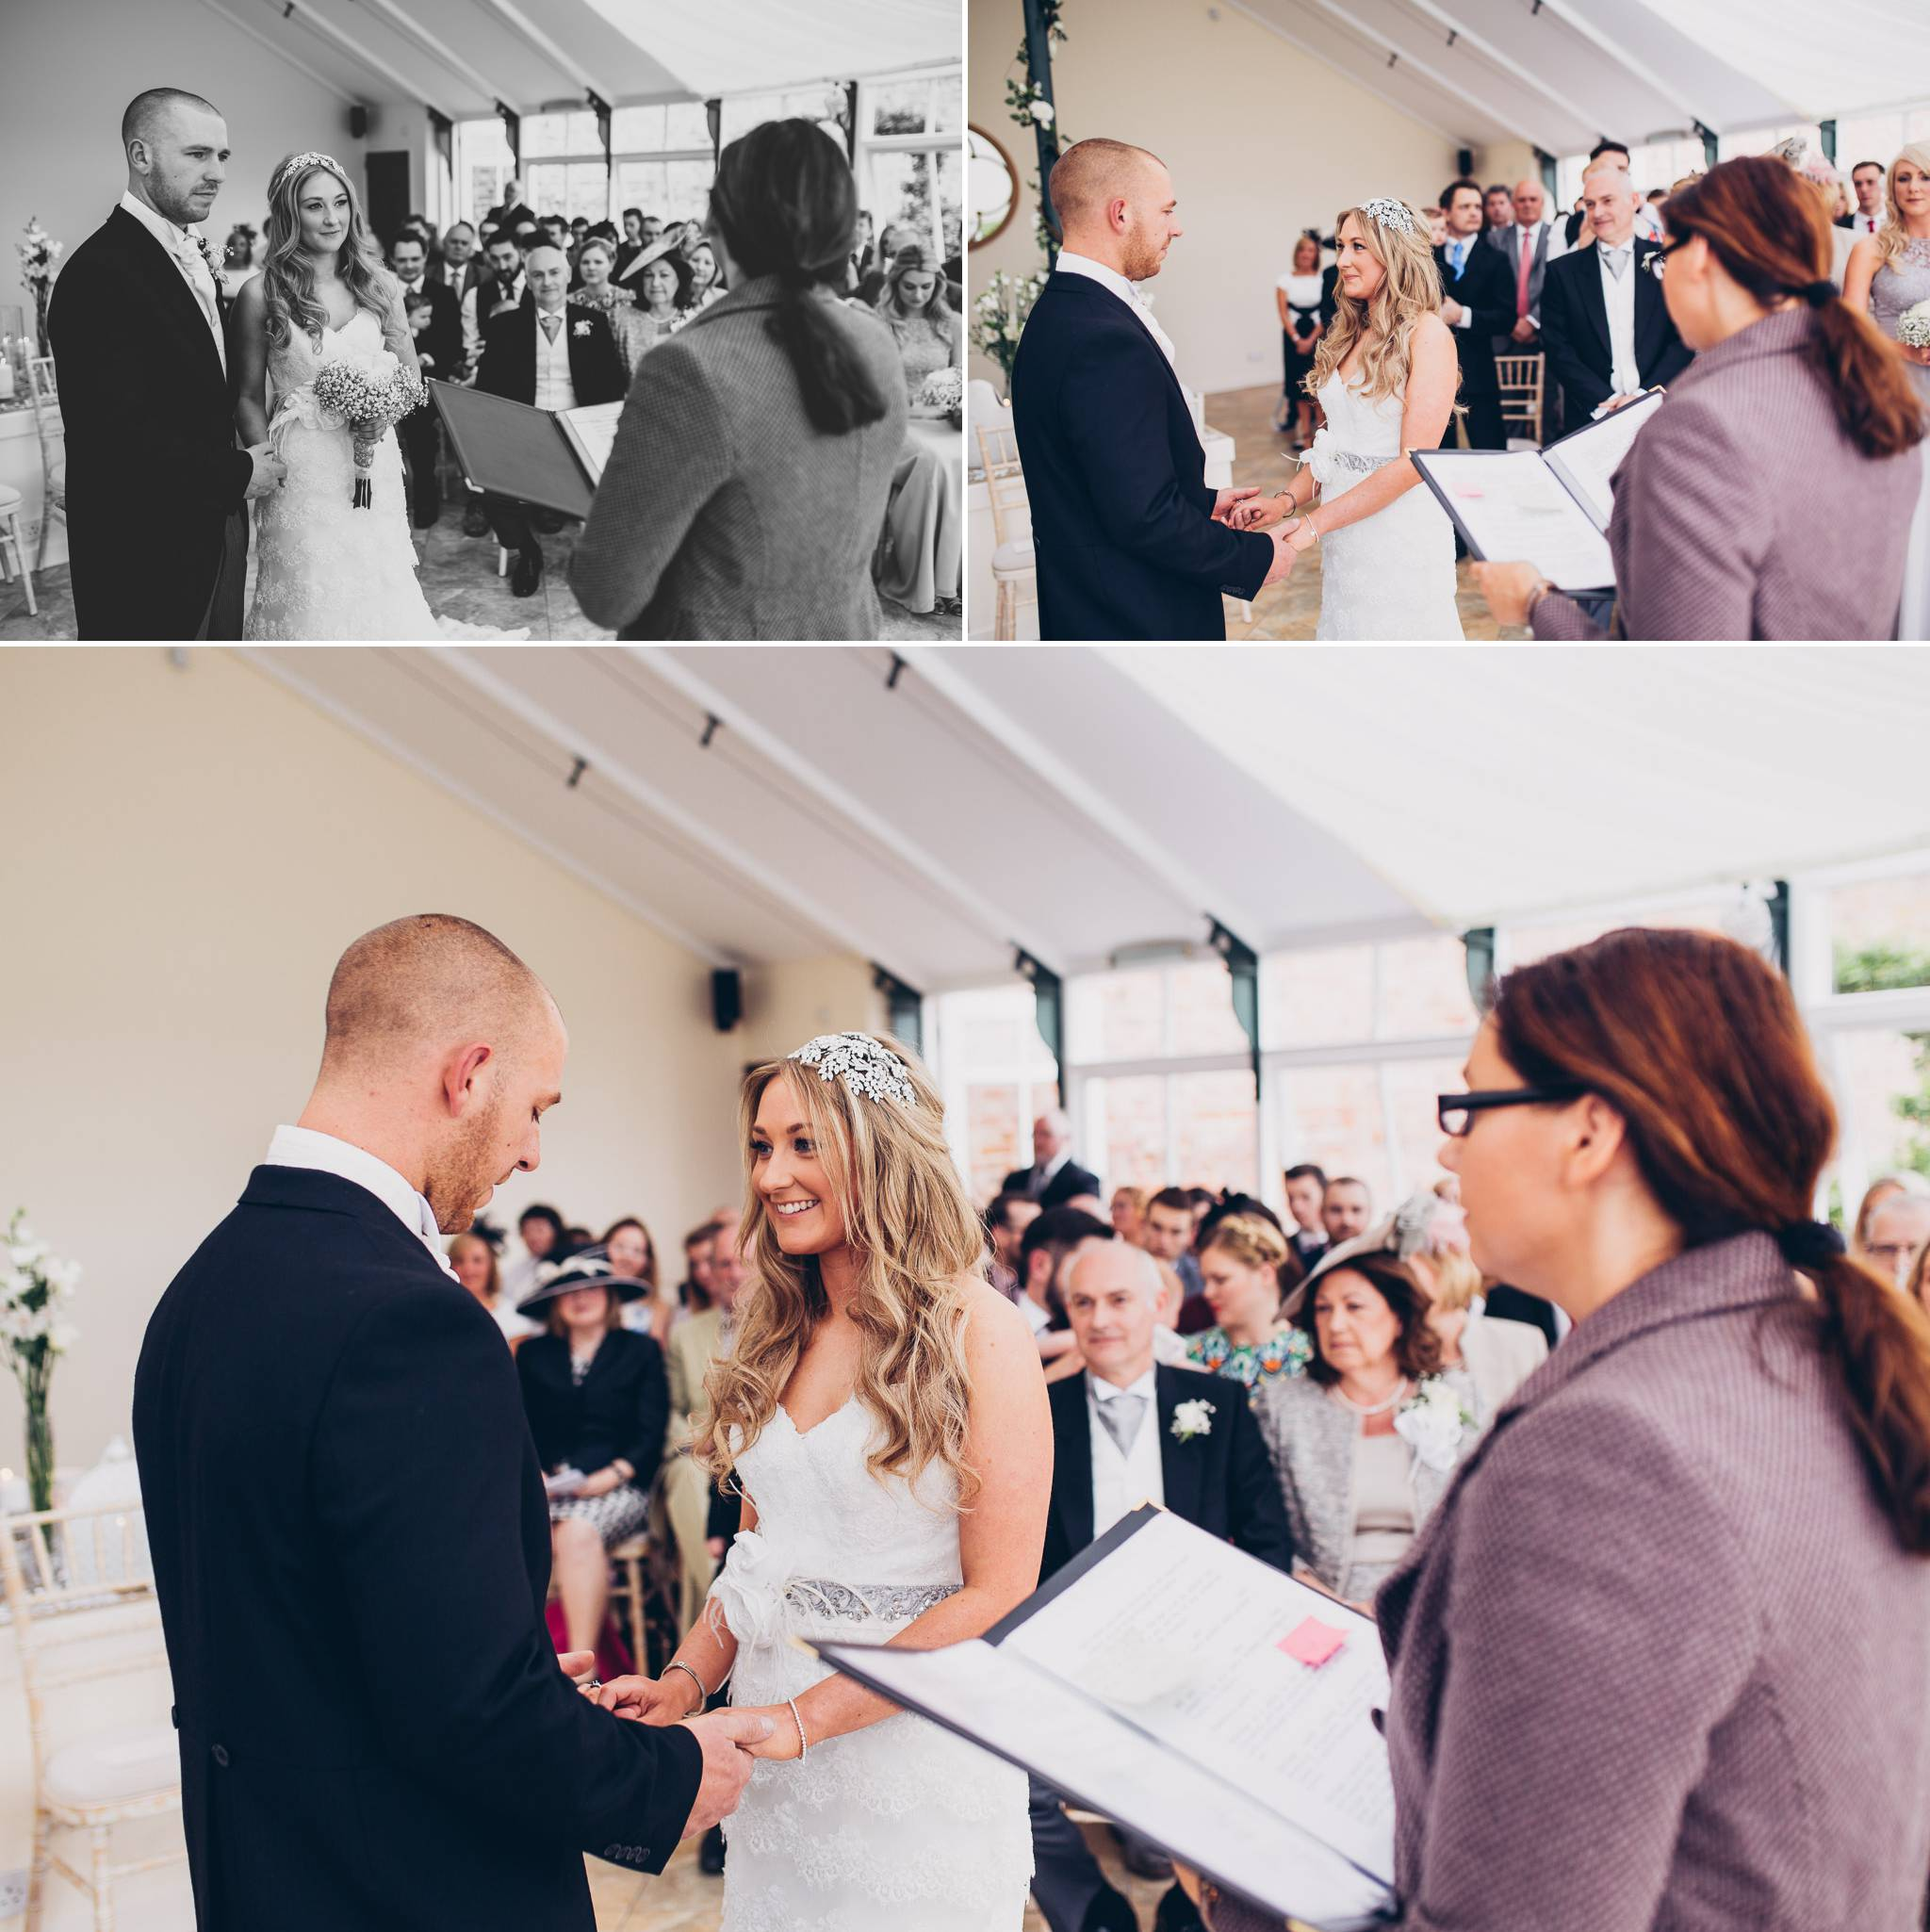 shropshire-wedding-photography 10.jpg